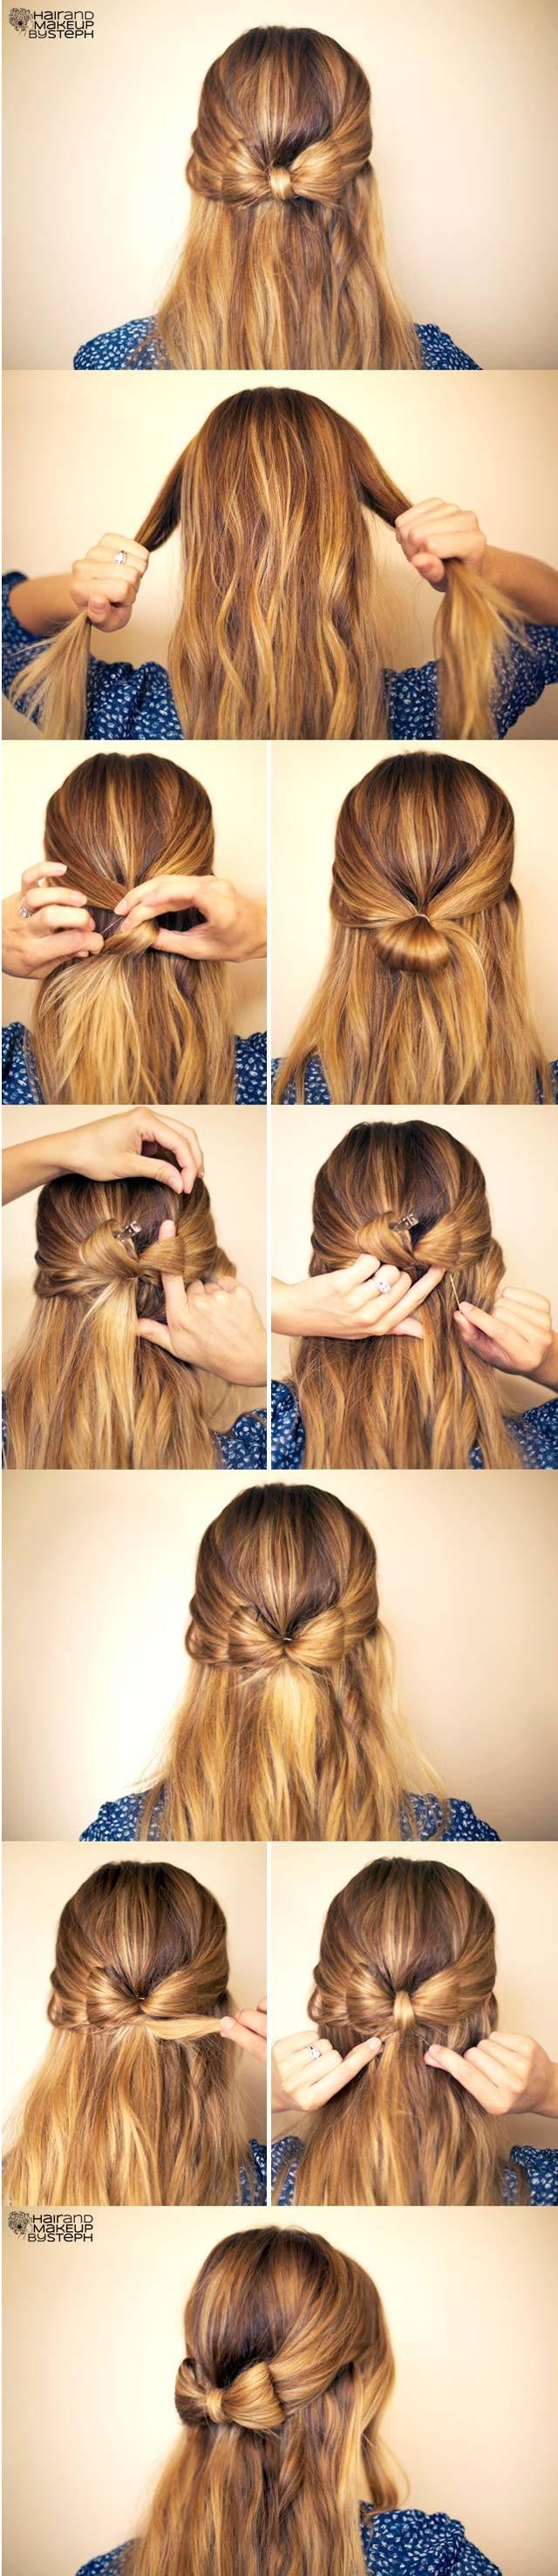 Super 15 Cute Hairstyles Step By Step Hairstyles For Long Hair Short Hairstyles Gunalazisus